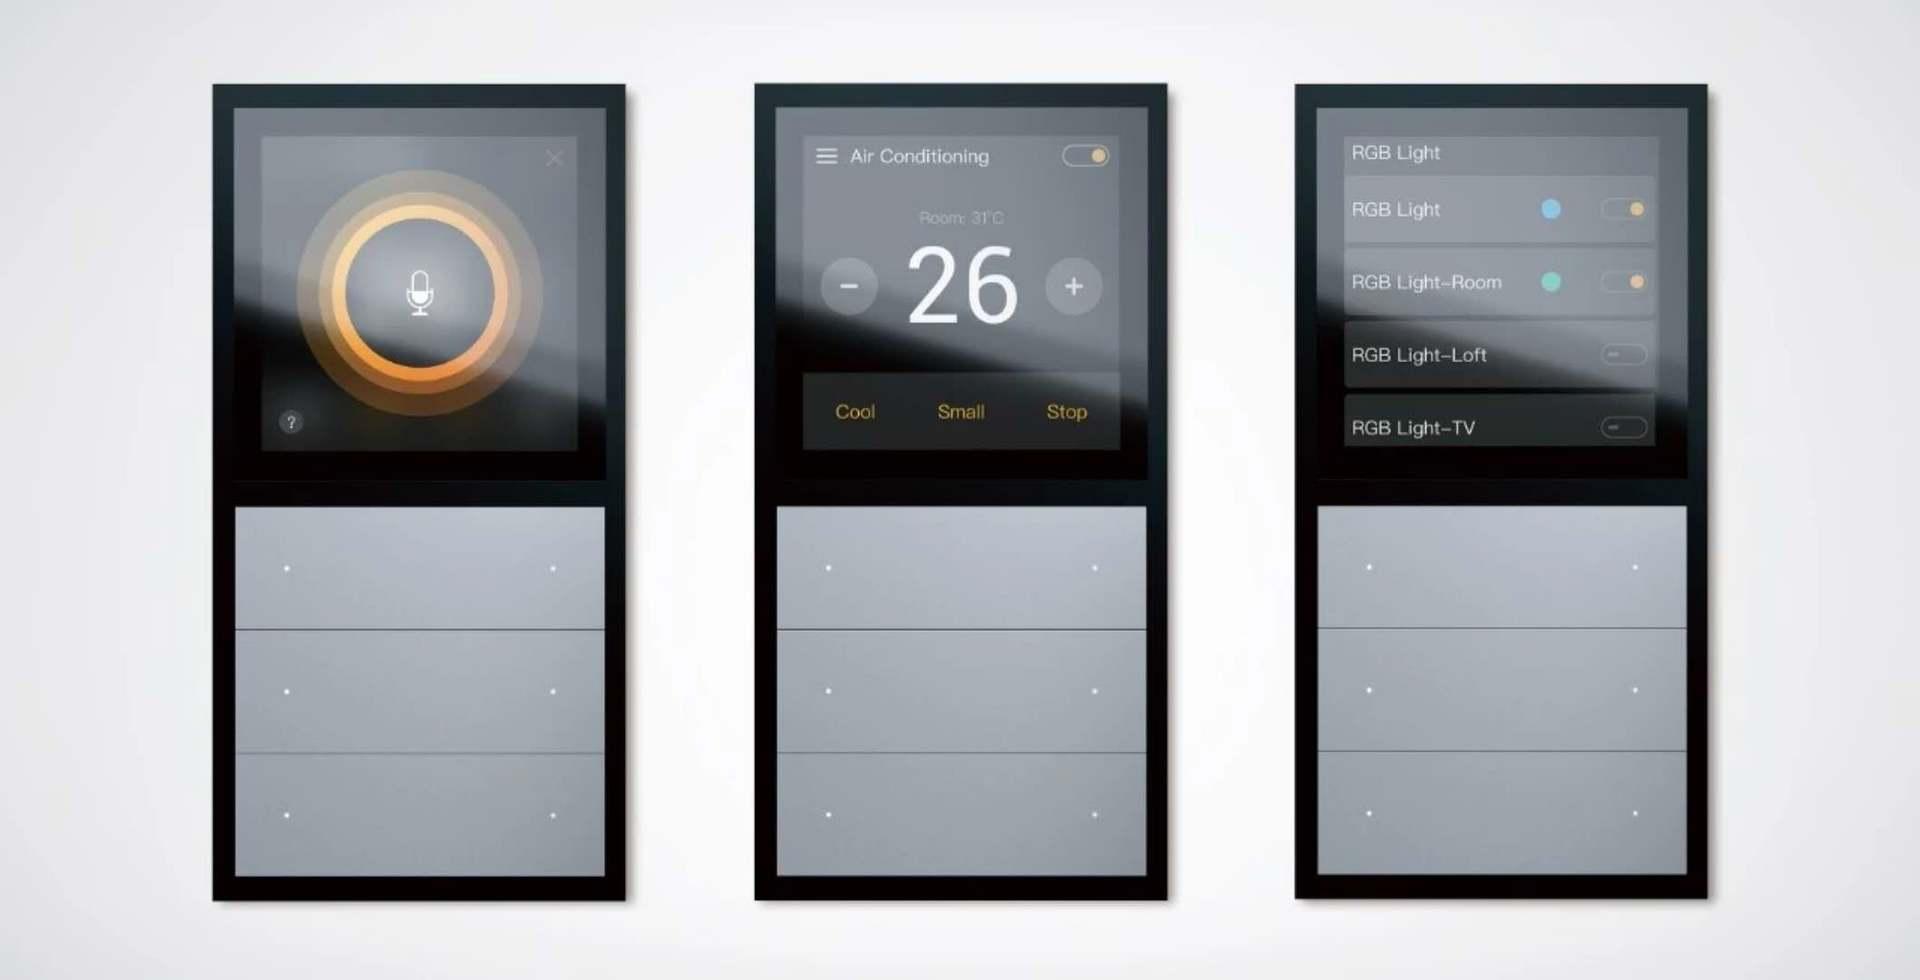 Panel controller TFT screen